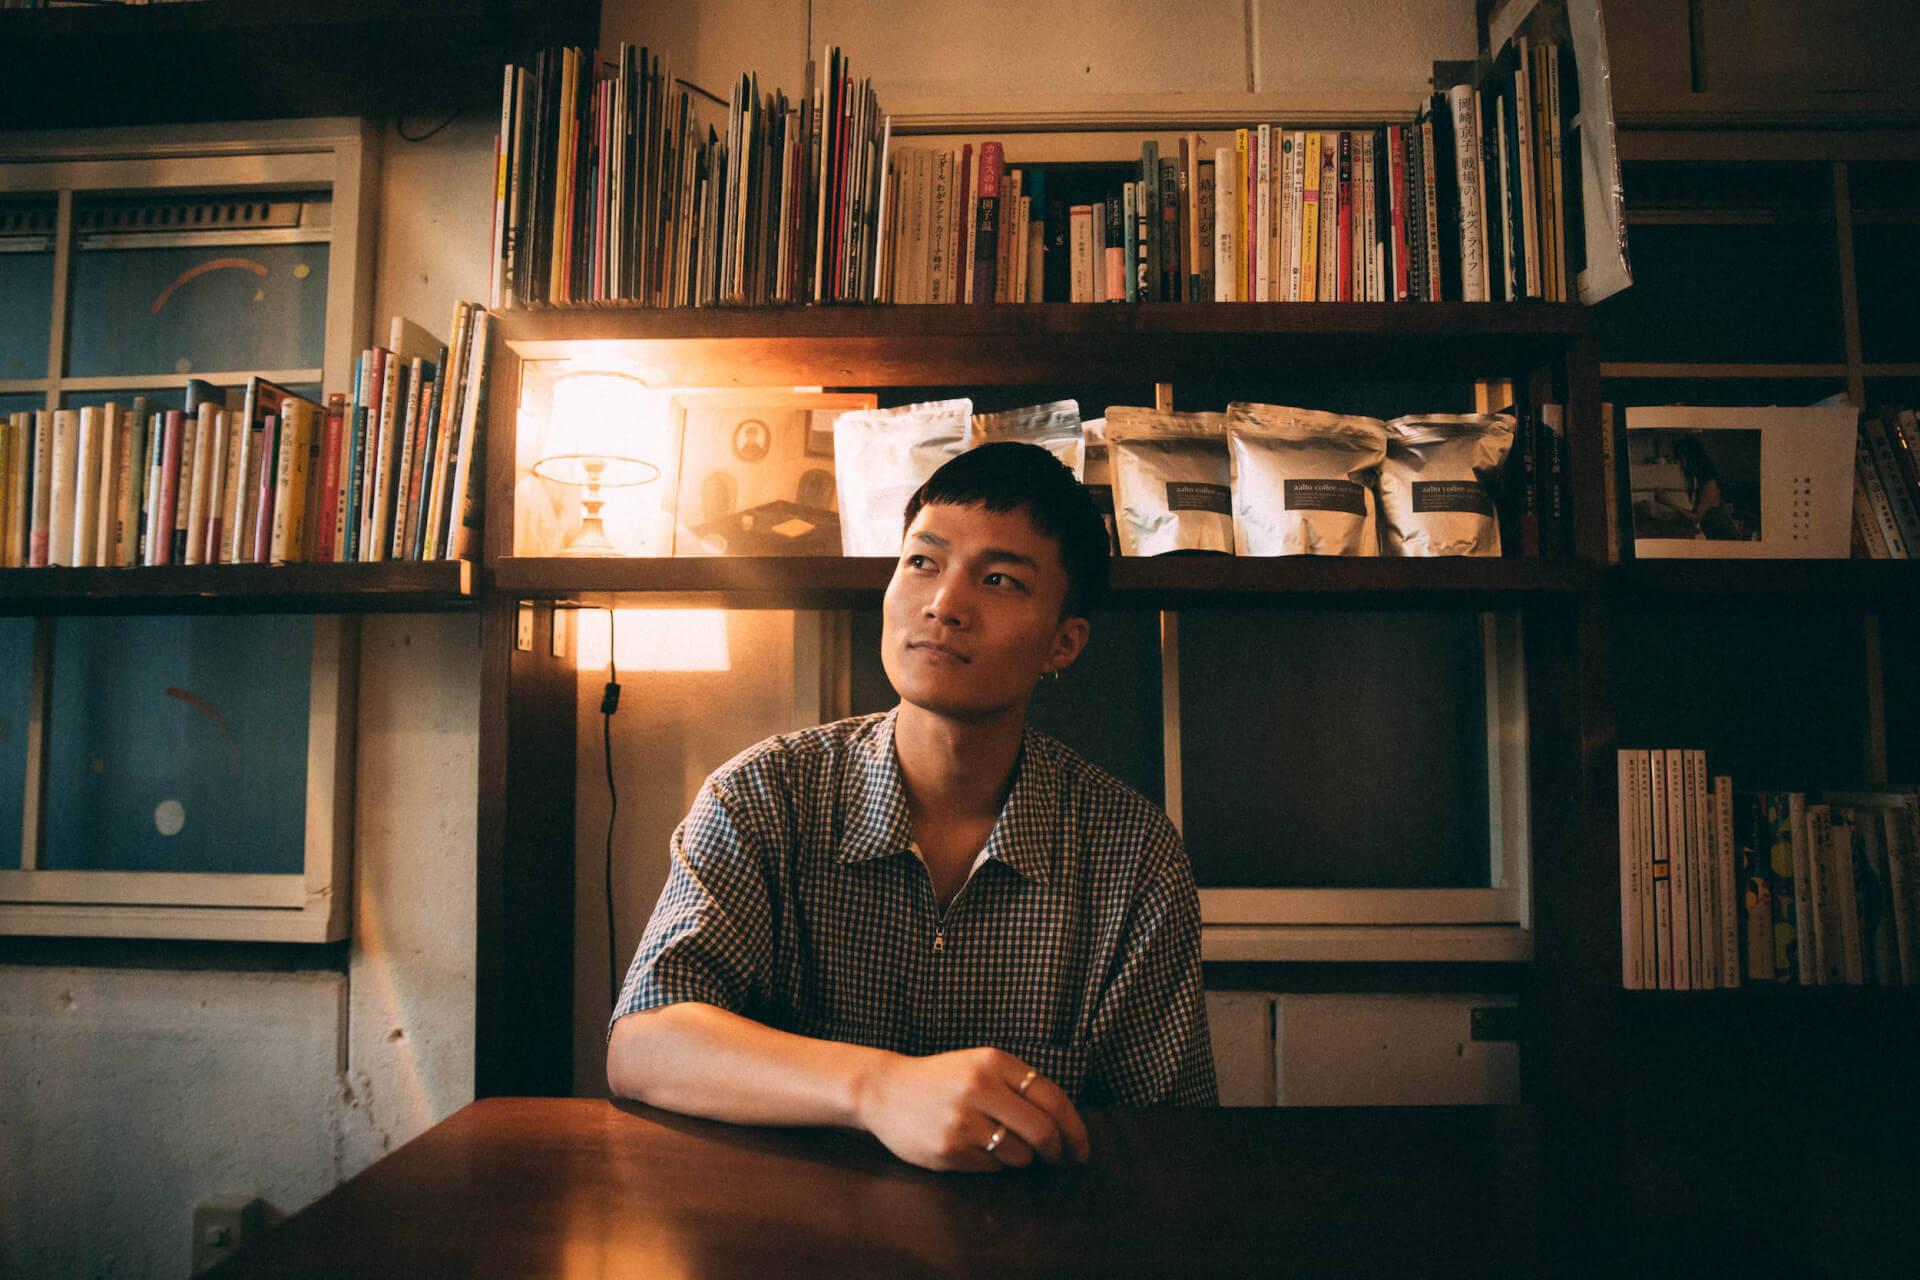 Shin Sakiuraが持つ無数の顔 — 初期衝動と現在地、ワンマンライブを語るインタビュー interview_190909_shinsakiura_738